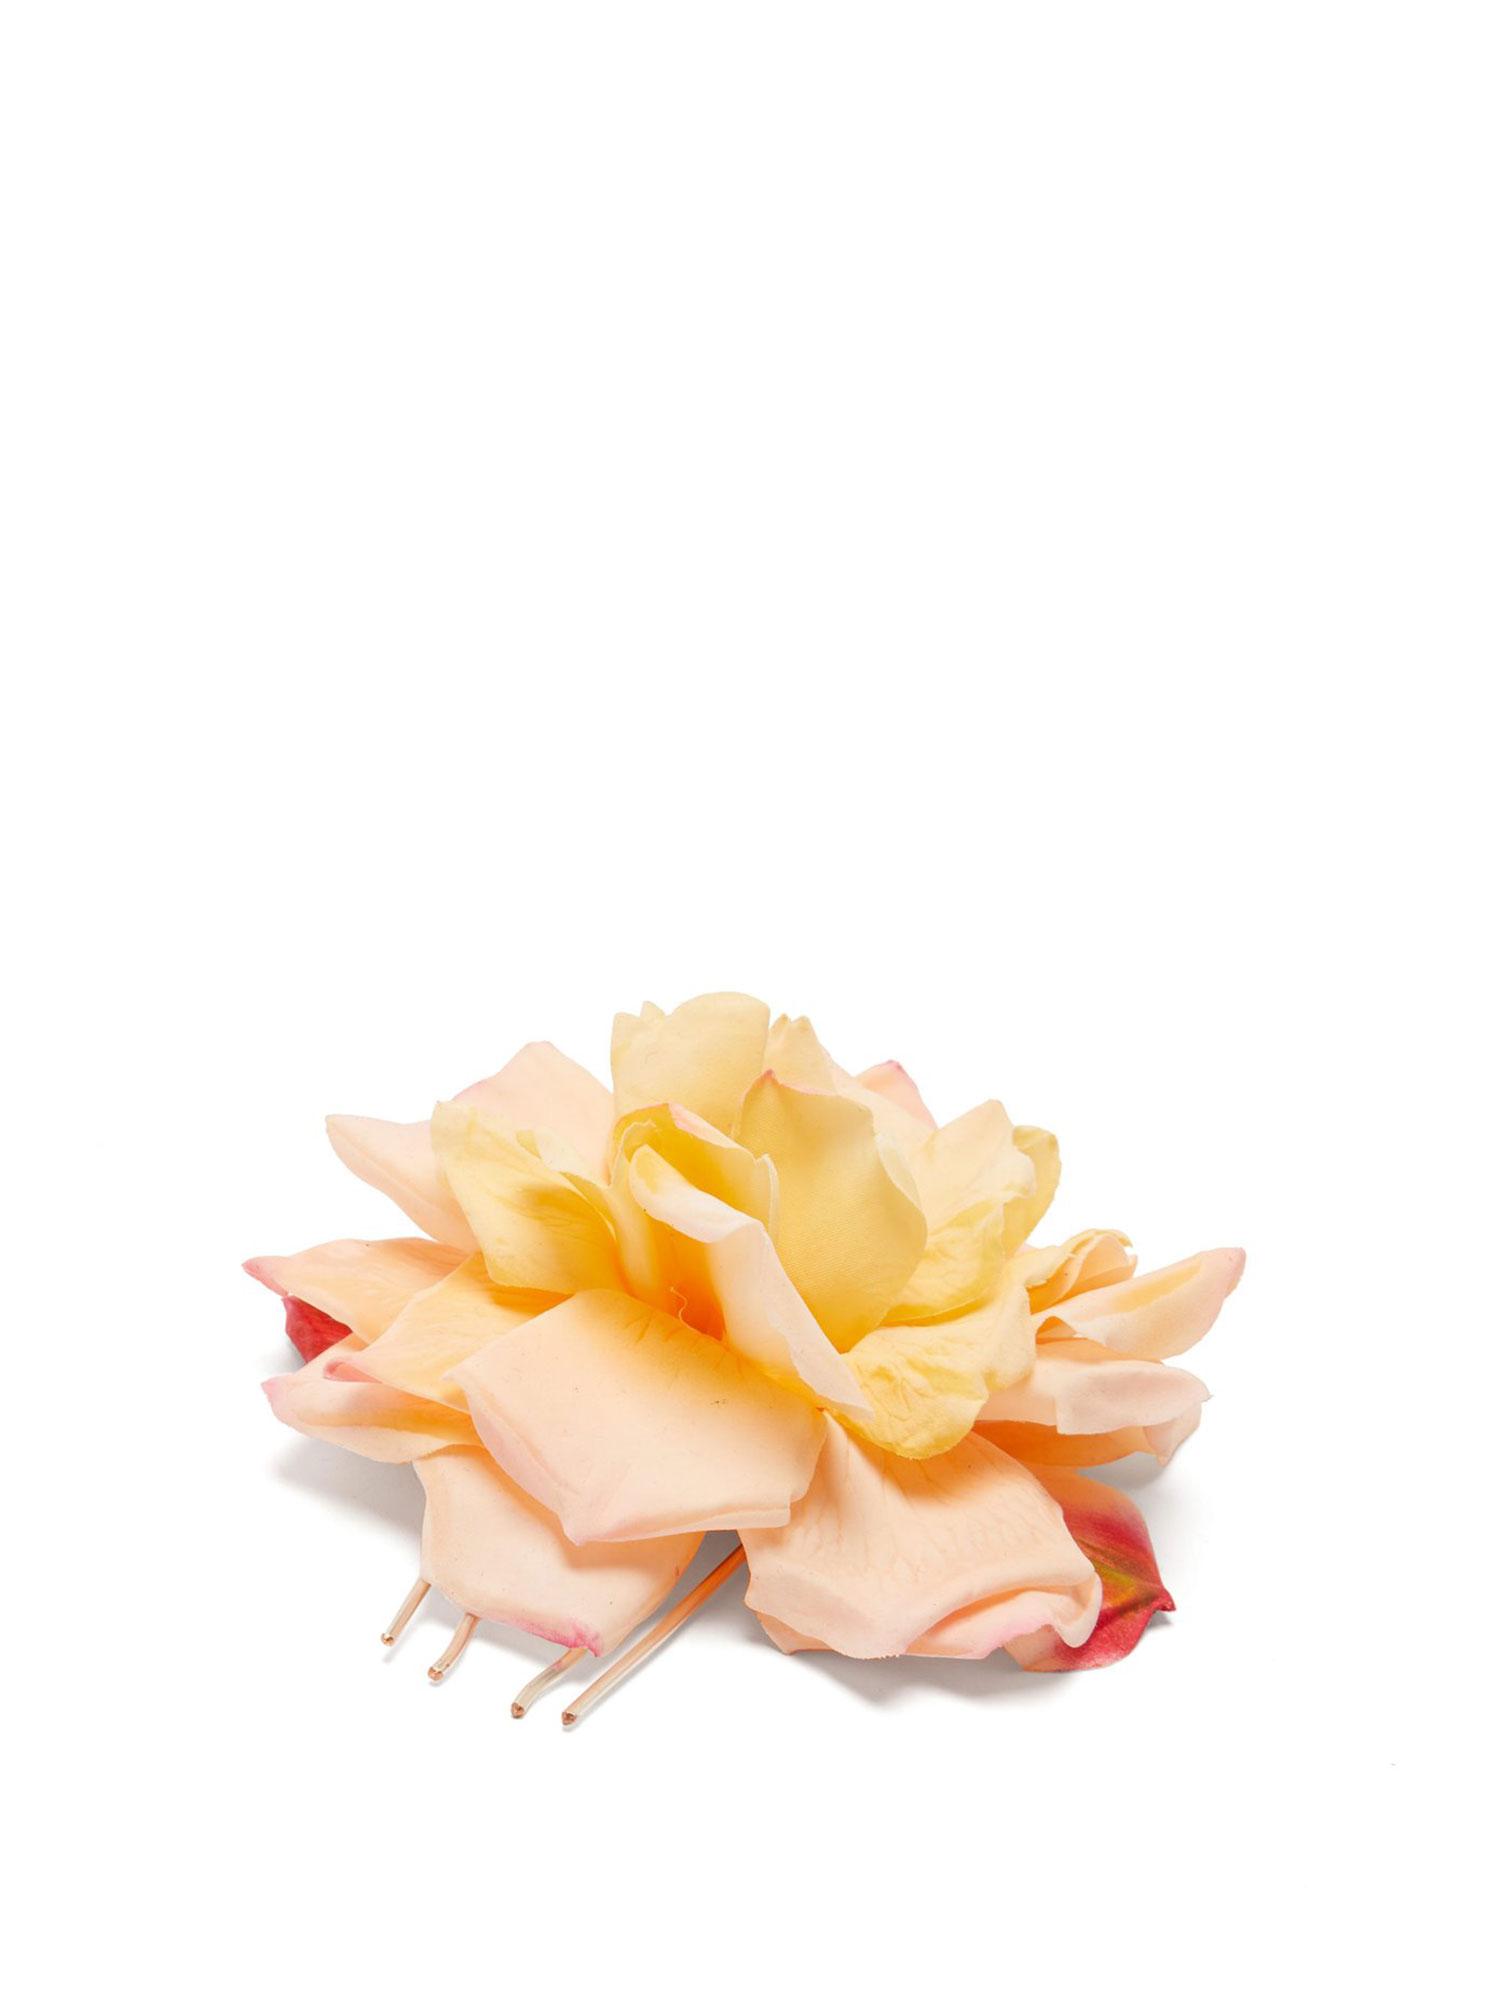 7f2fba52bdd27 Meghan Markle's Florist's Spring 2019 Flower Crowns, Clips: Pics